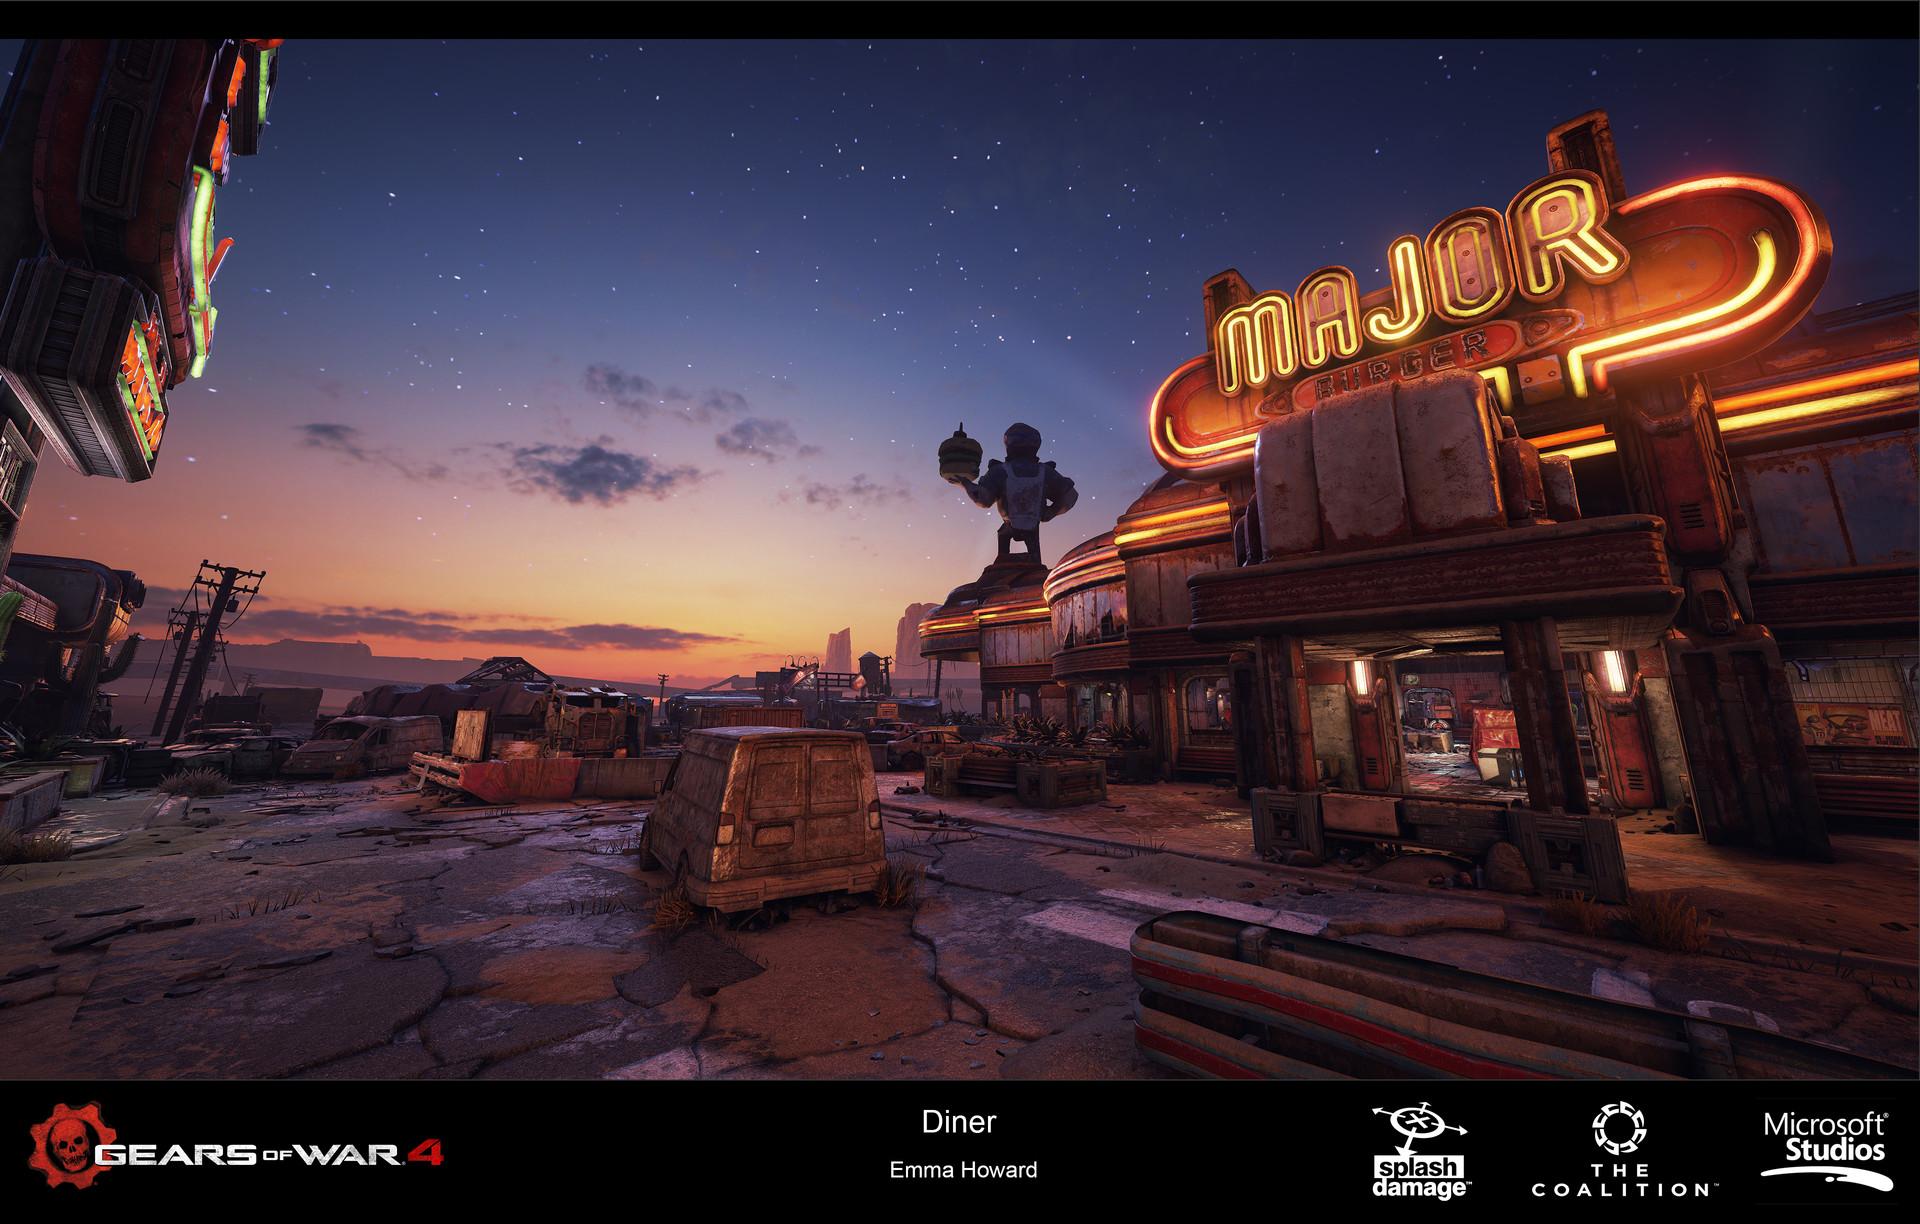 ArtStation - Gears of War 4 Multiplayer Map 'Diner', Emma Howard